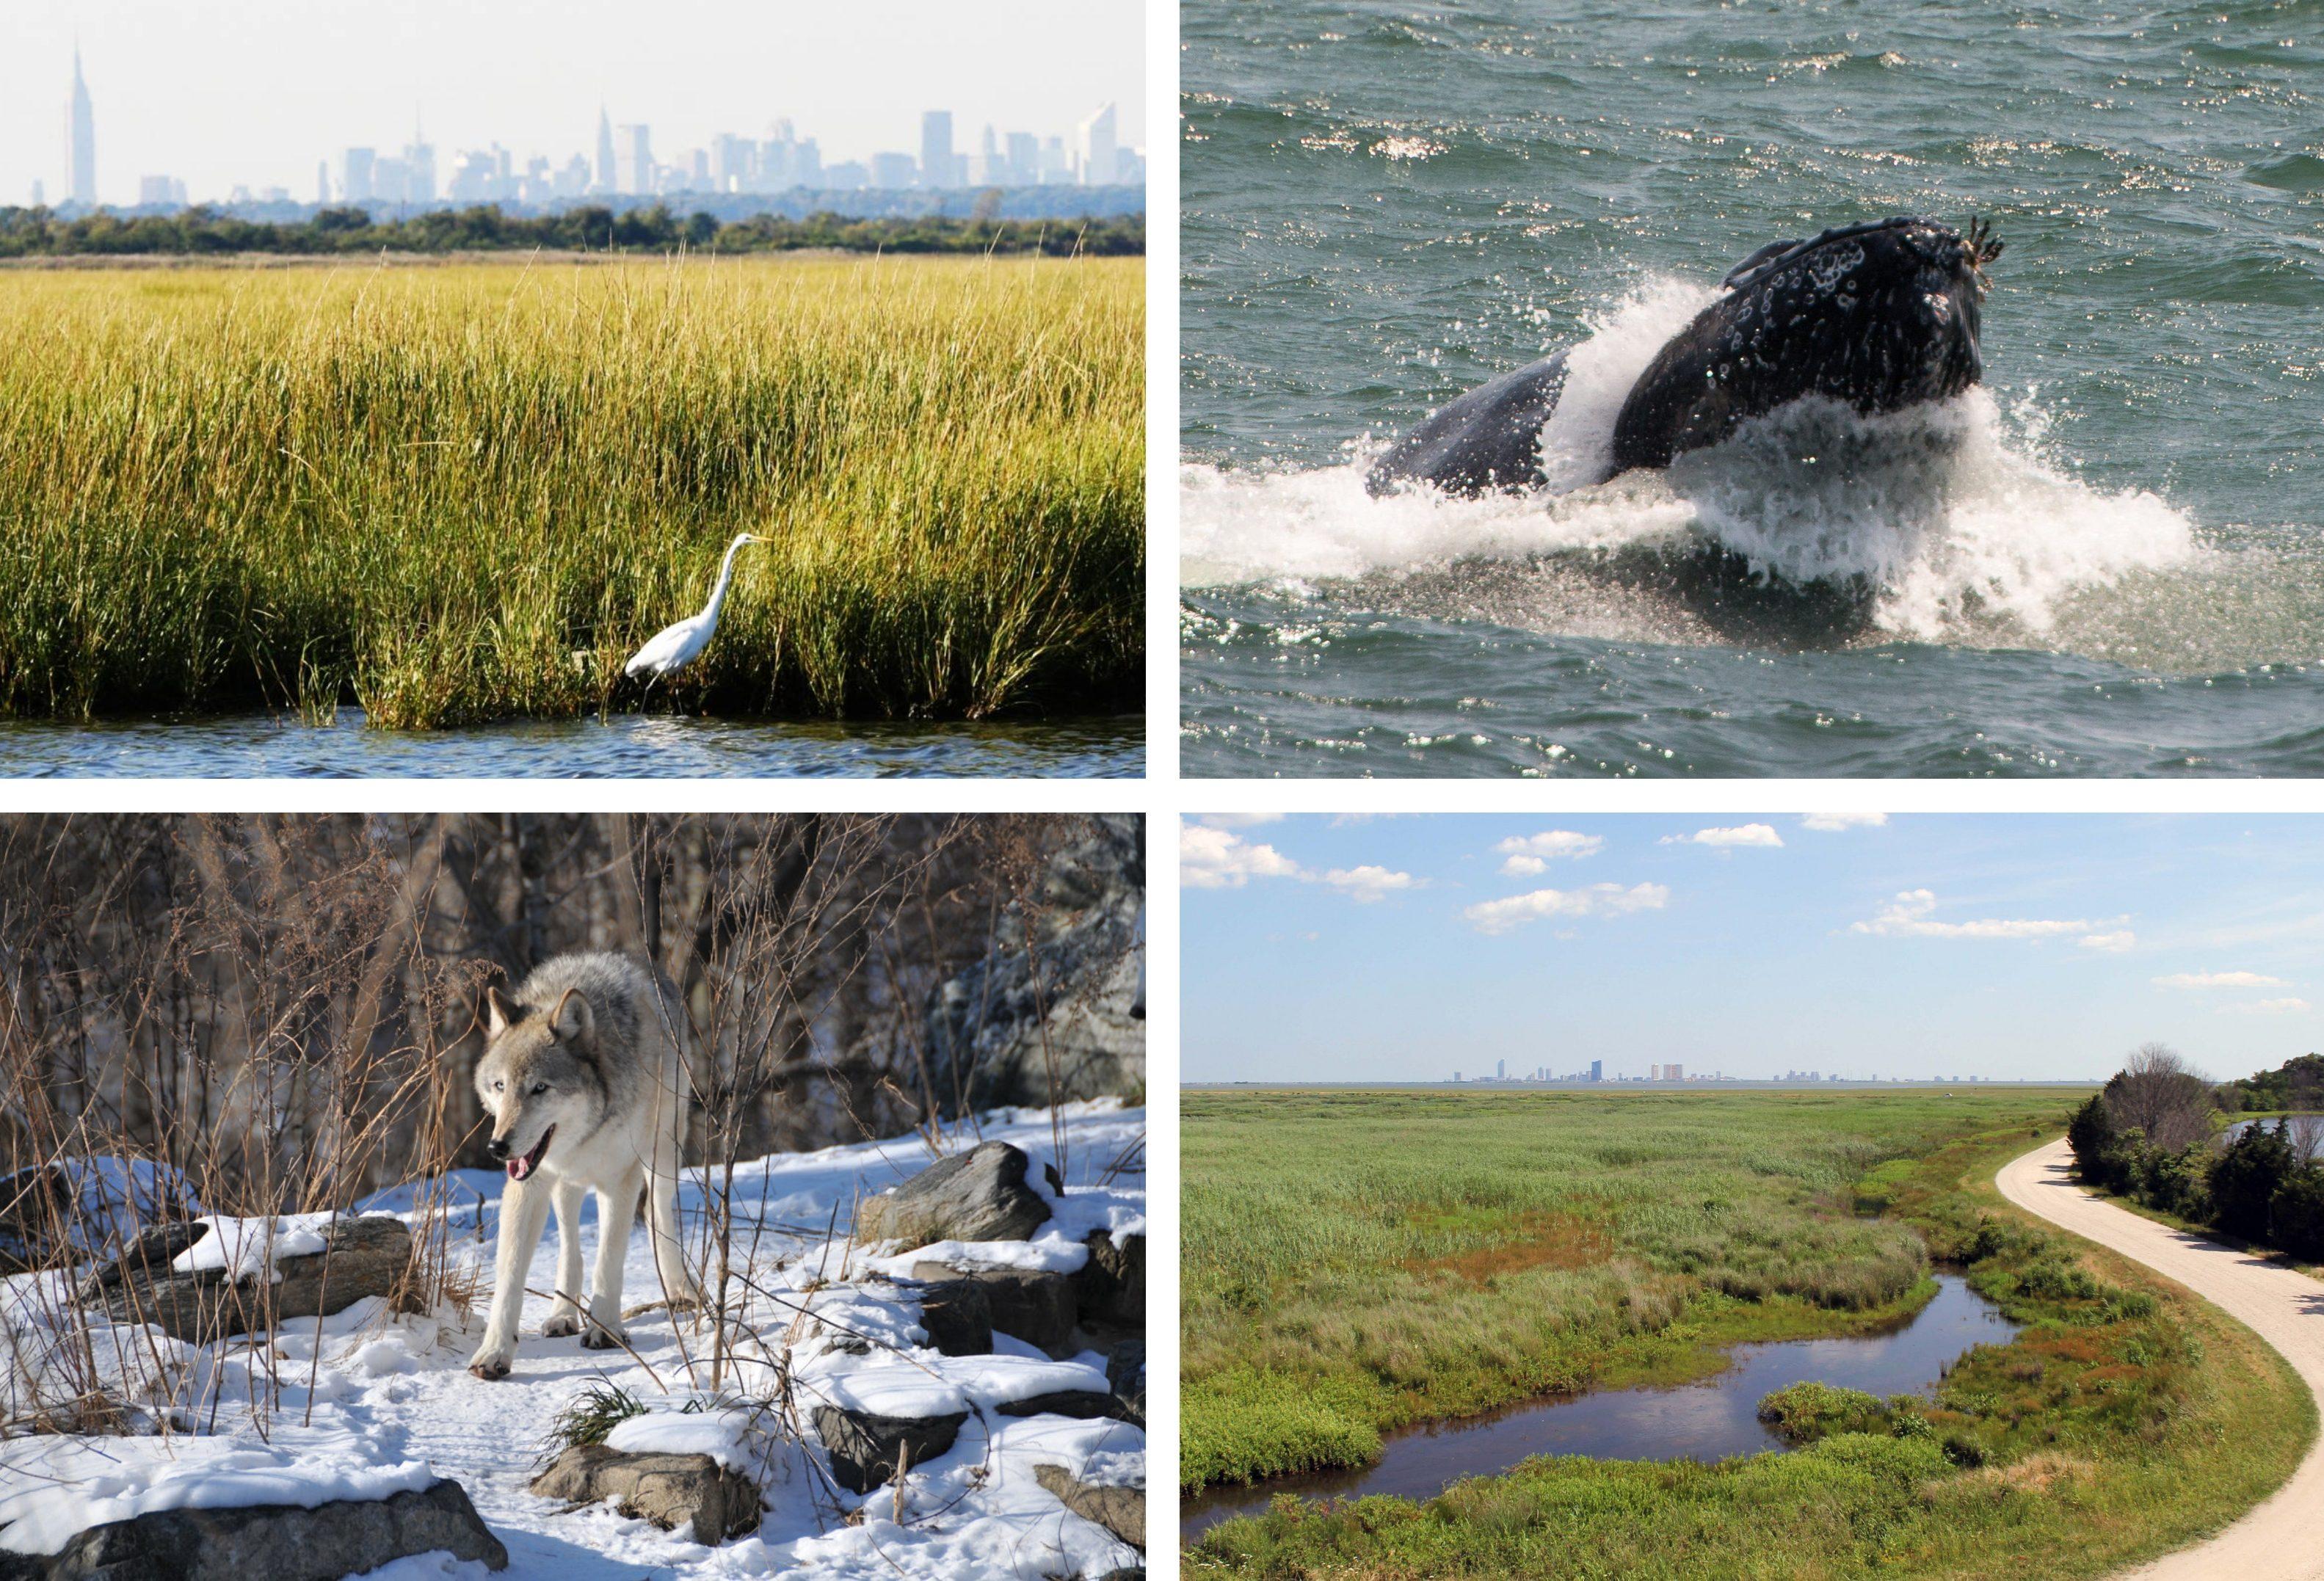 The 8 best wildlife activities in and around NYC | 6sqft